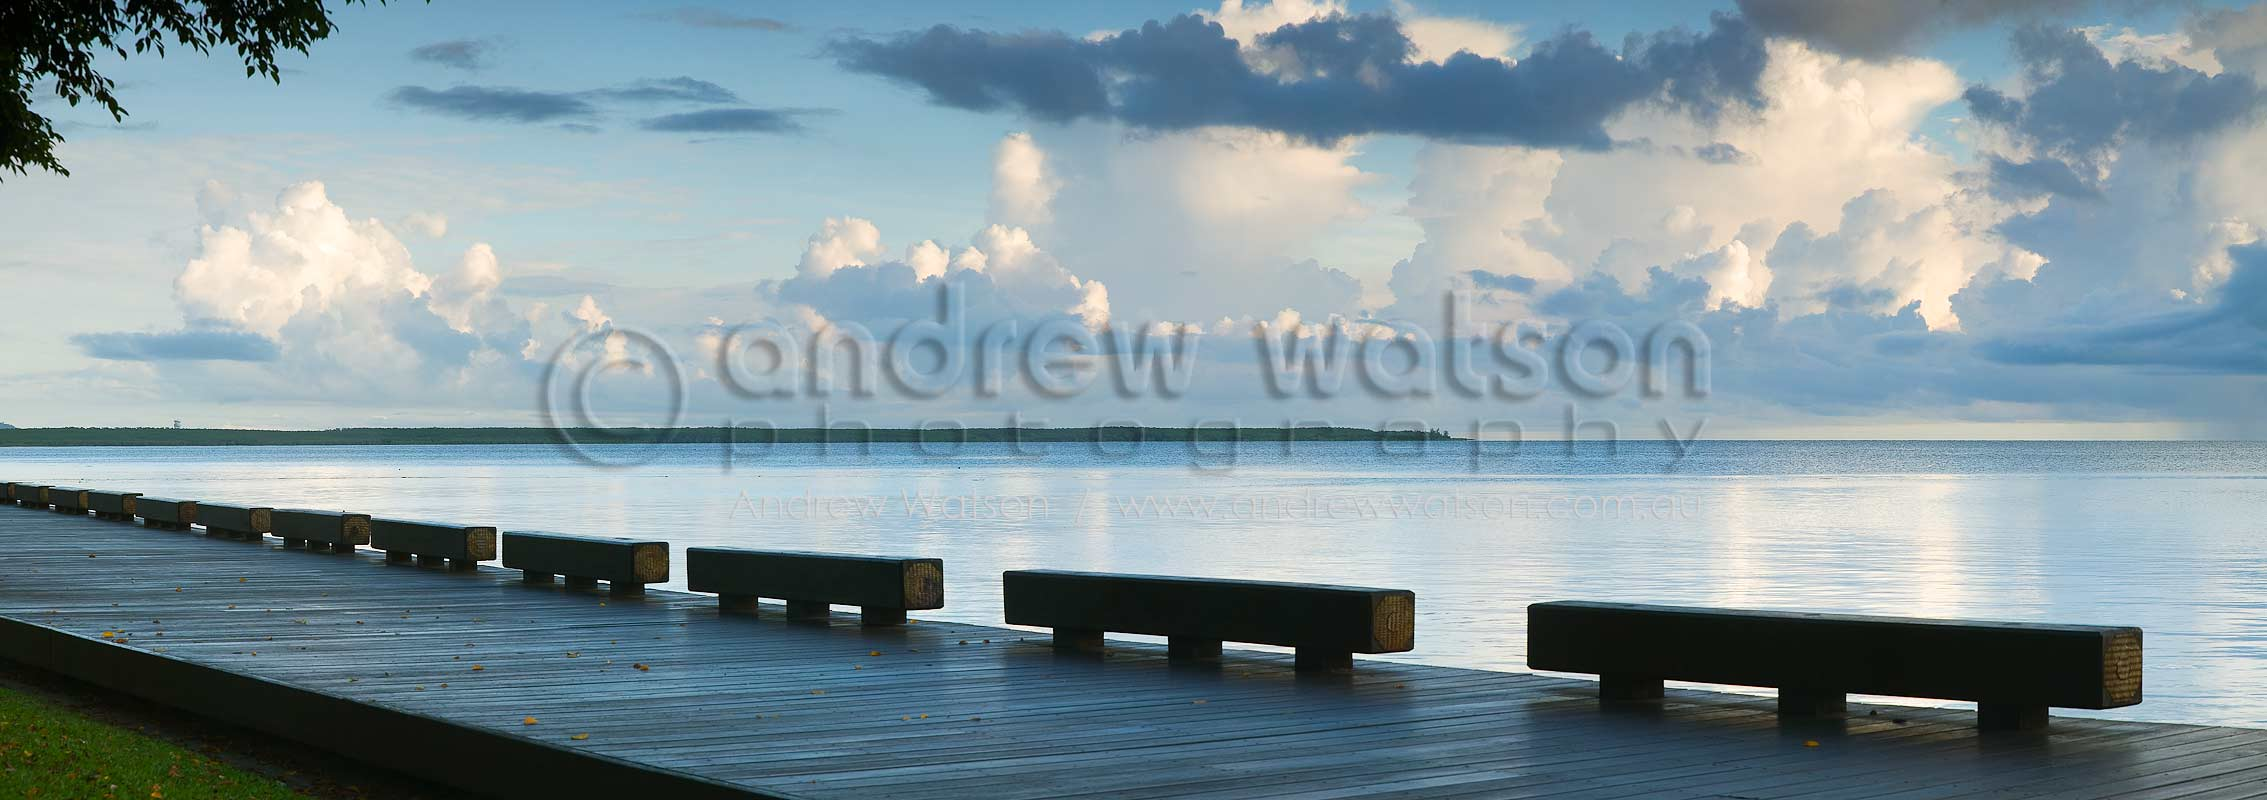 Esplanade boardwalkCairns, North QueenslandImage available for licensing or as a fine-art print... please enquire